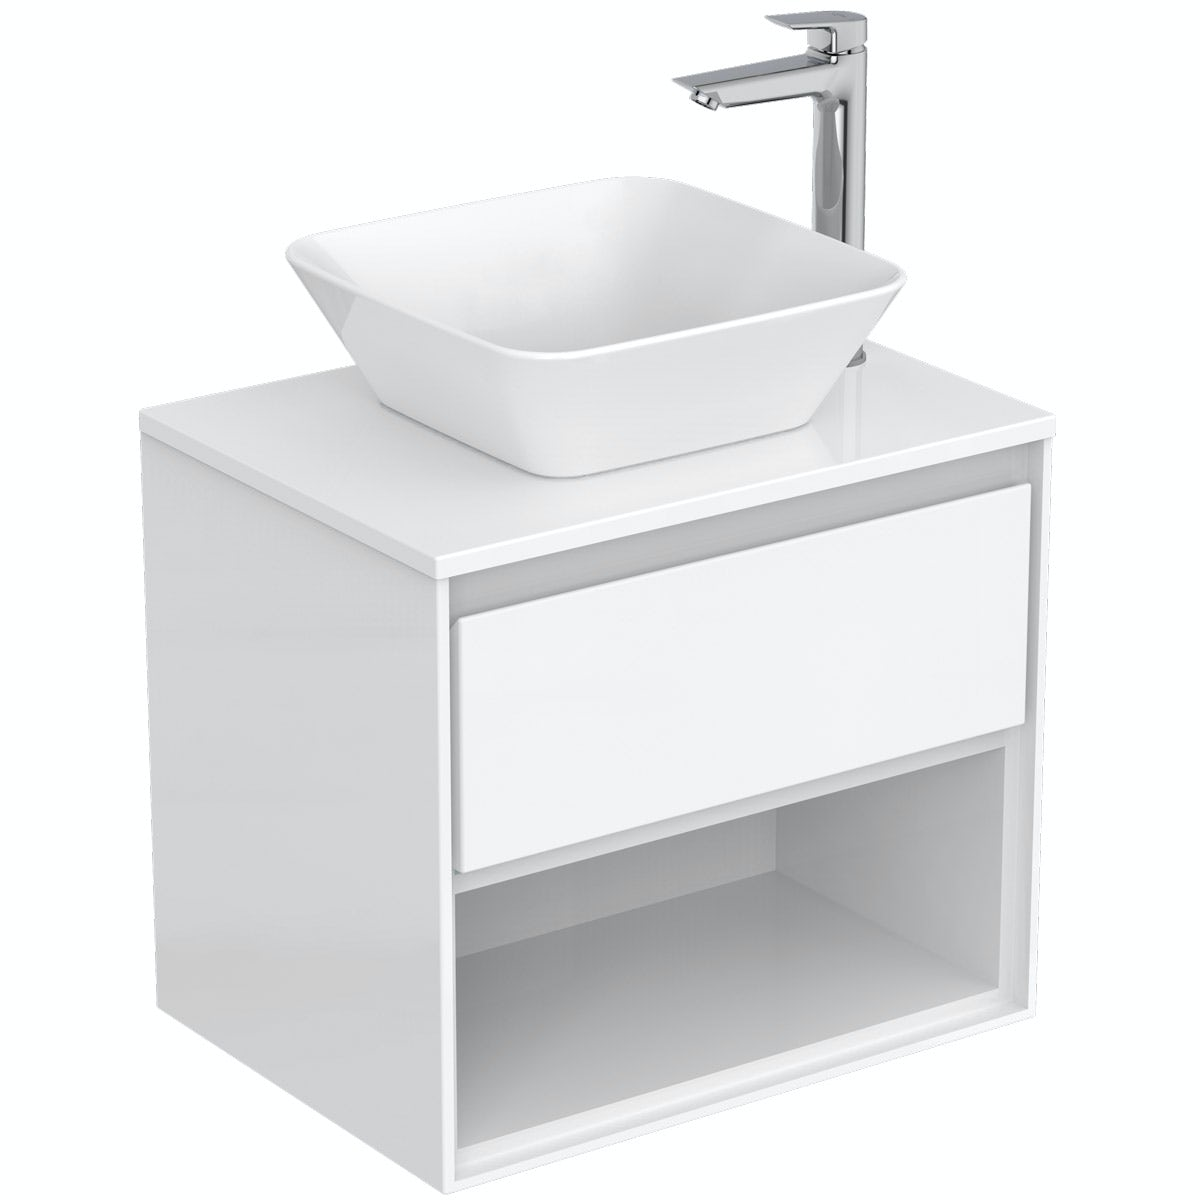 Ideal Standard Concept Air gloss and matt white wall hung countertop vanity unit and basin 600mm